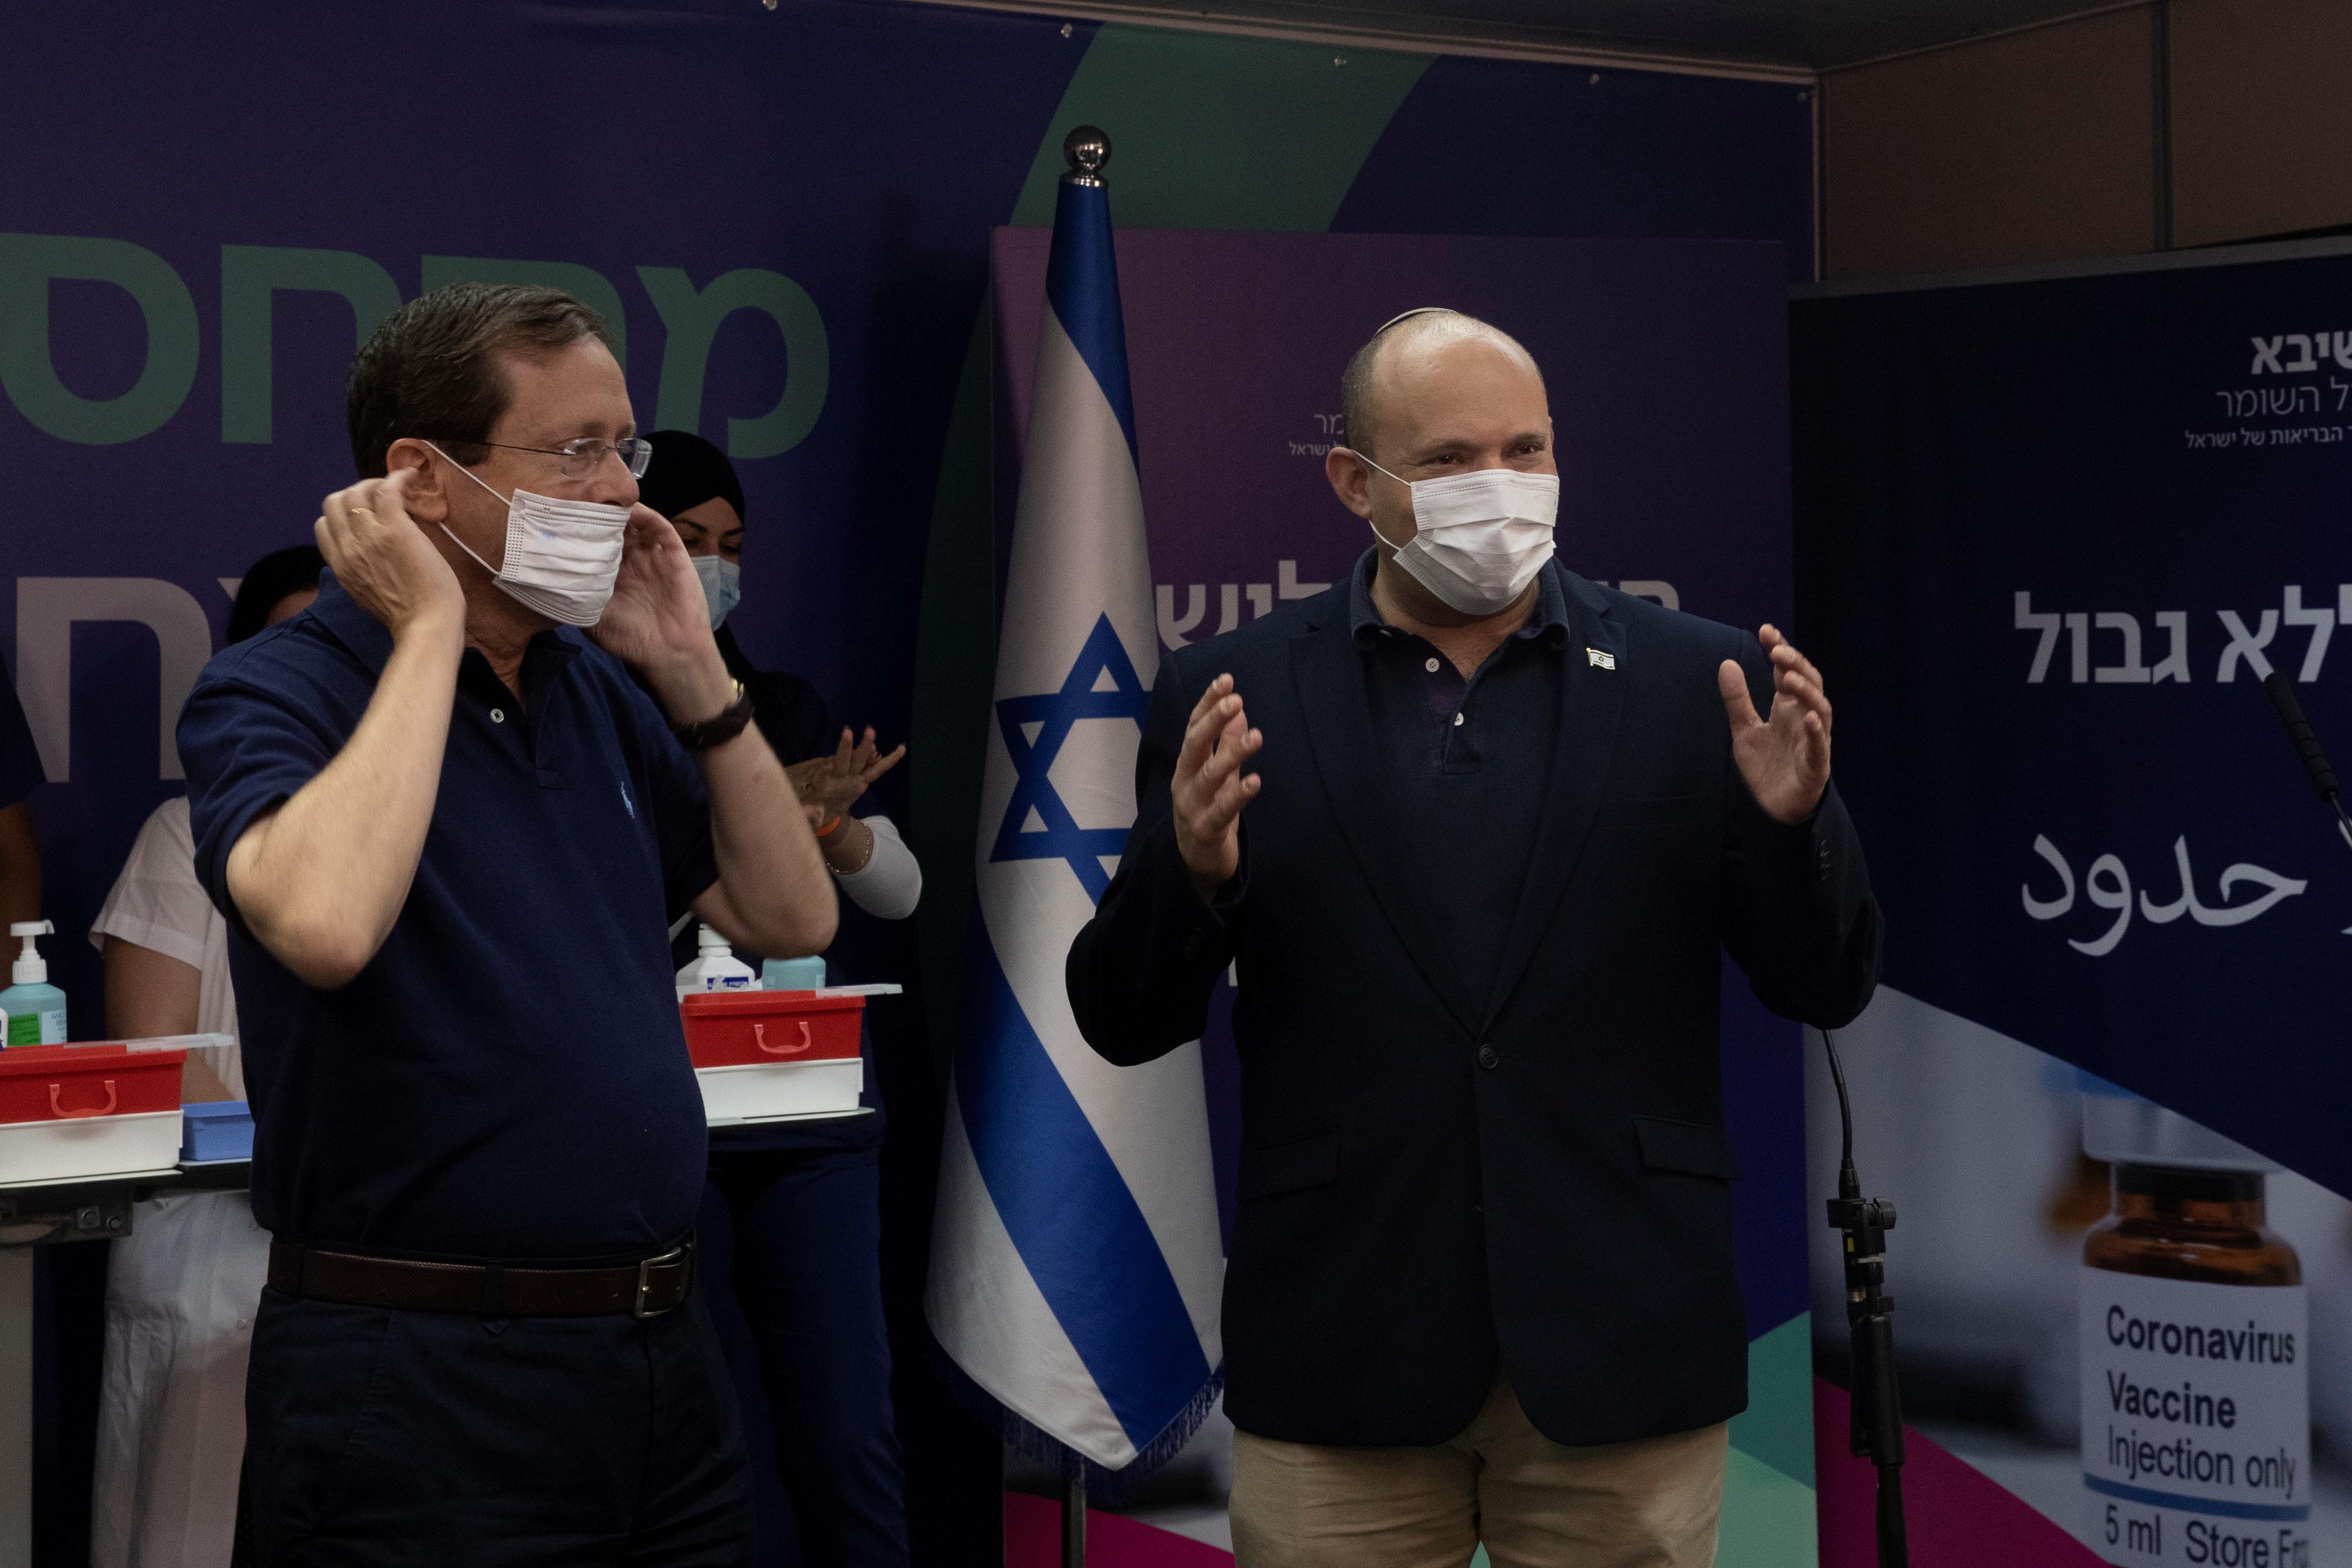 Israeli President Isaac Herzog adjusts his mask as Prime Minister Naftali Bennett, speaks to members of the media after Herzog received a third dose of coronavirus disease (COVID-19) vaccine at Sheba Medical Center in Ramat Gan, Israel, July 30, 2021. Maya Alleruzzo/Pool via REUTERS